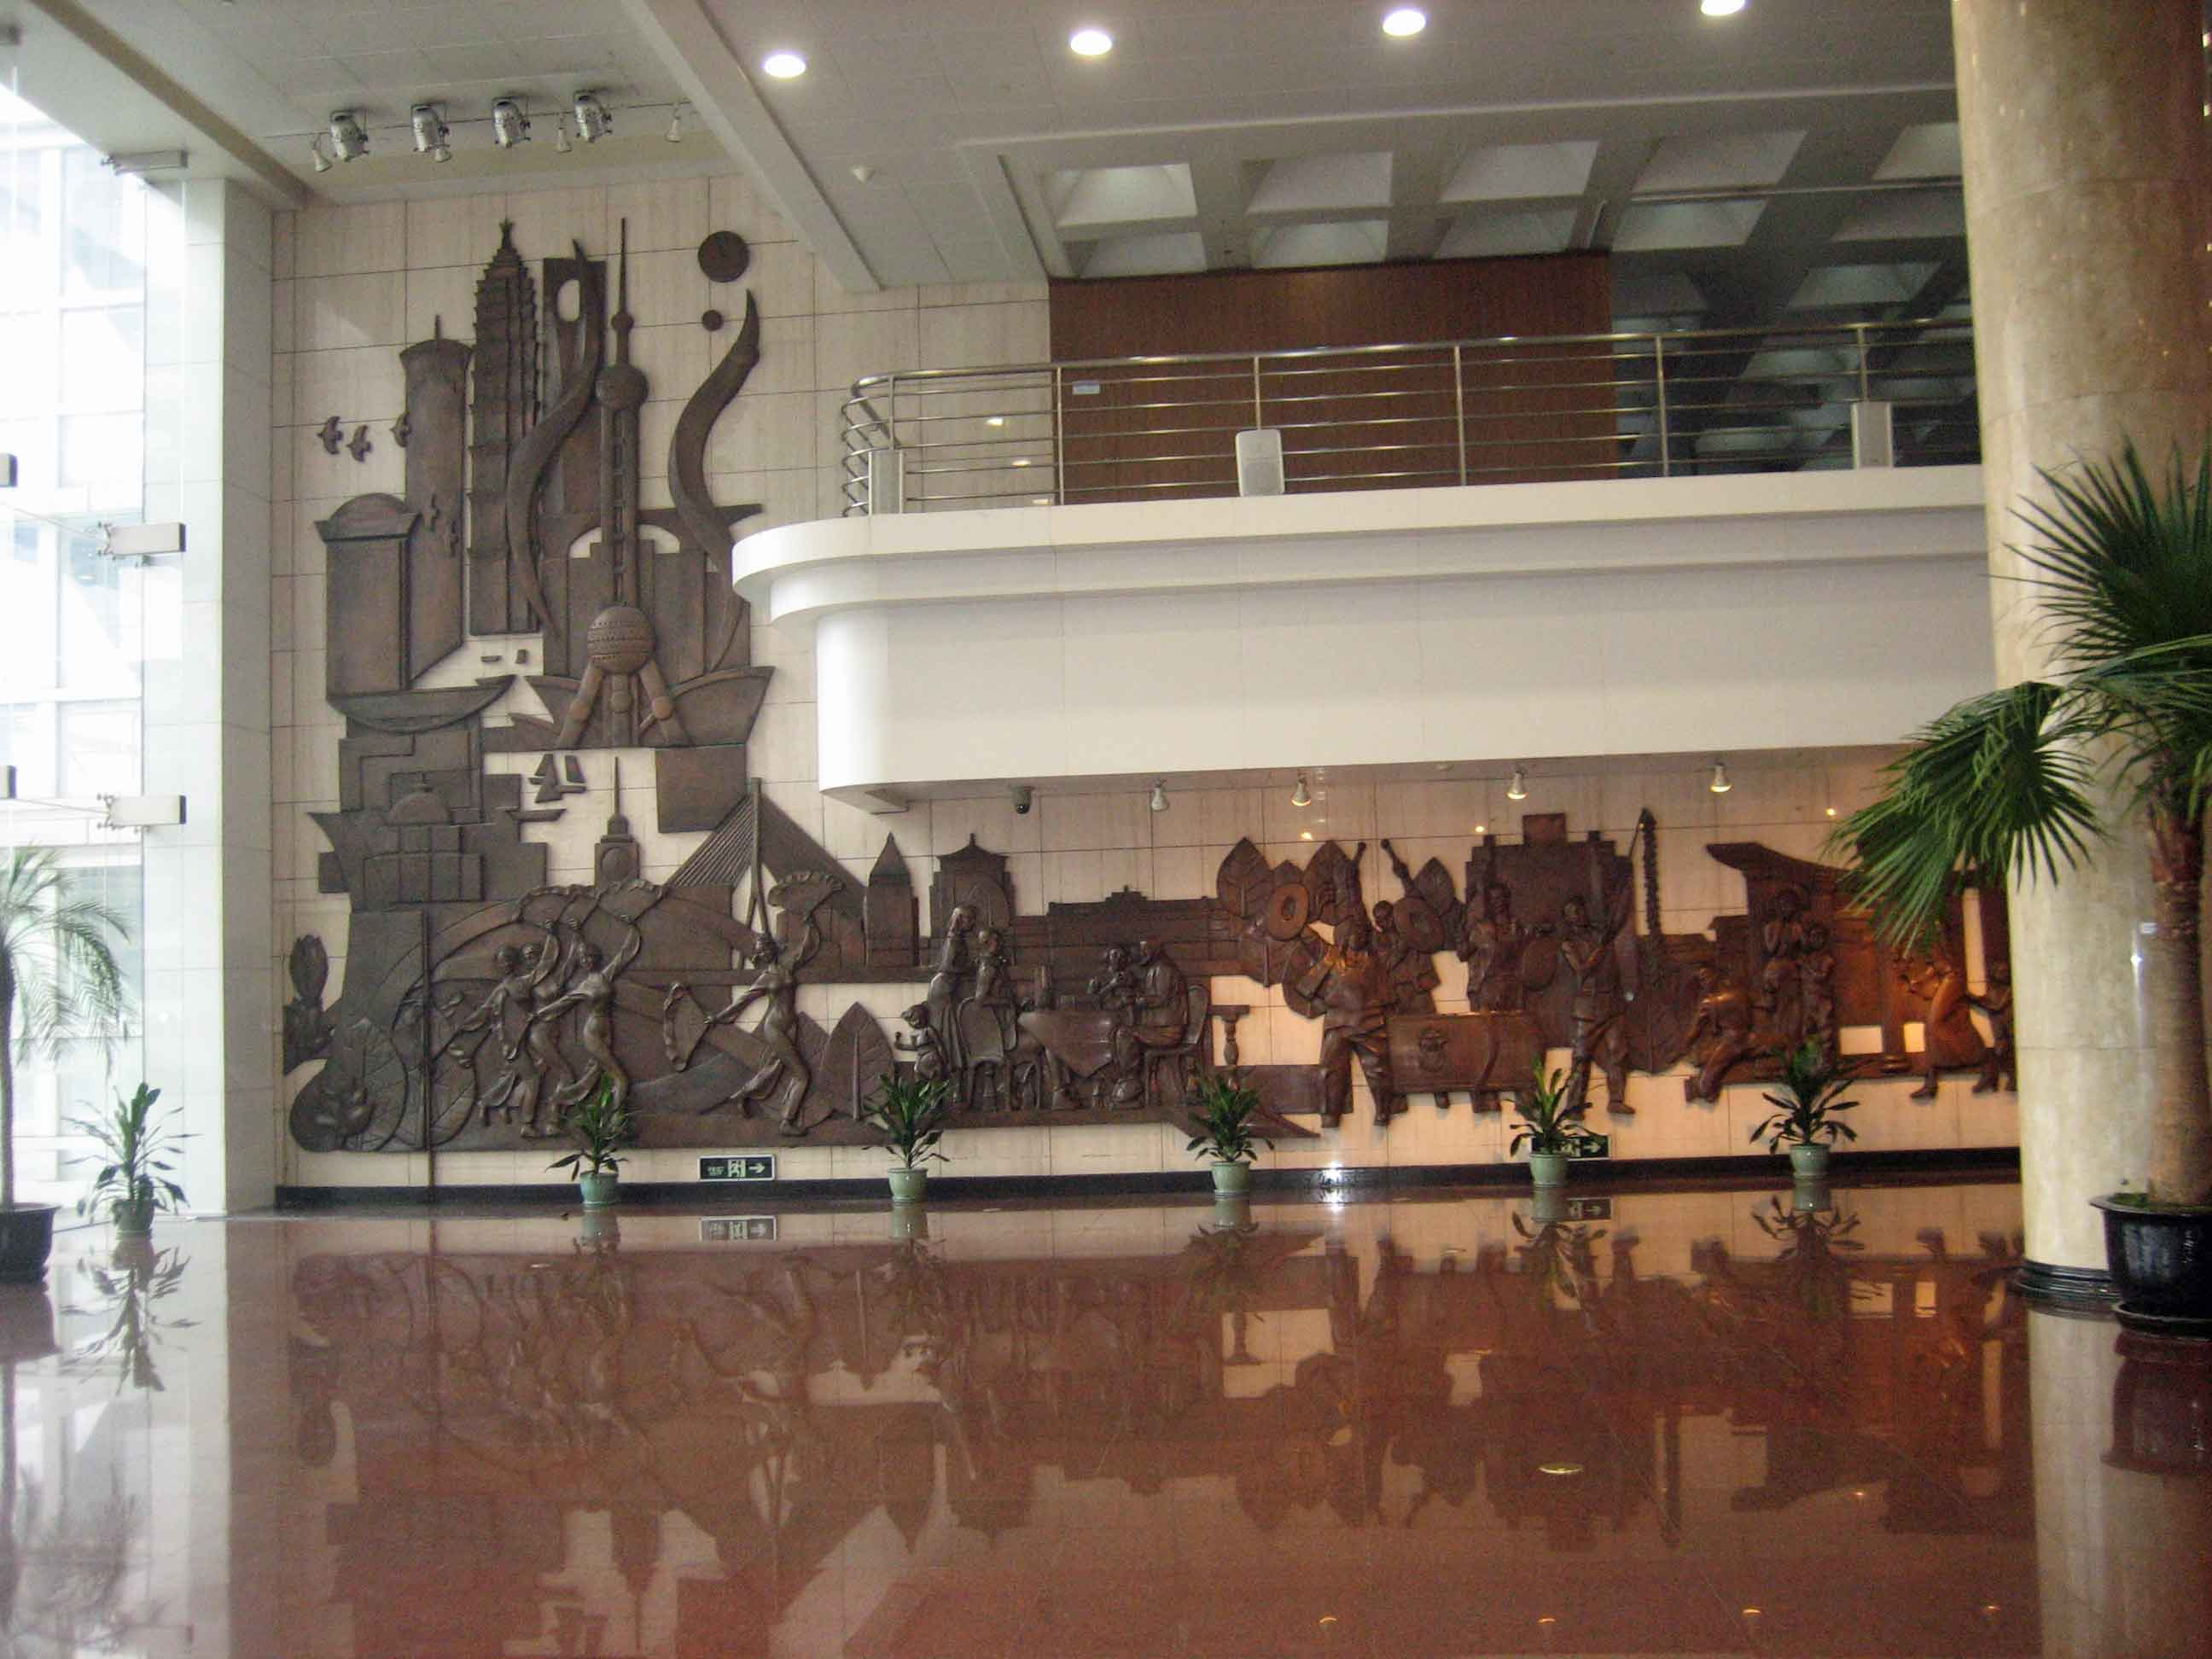 shanghai urban planning exhibition center shanghai terrafirmatourist. Black Bedroom Furniture Sets. Home Design Ideas